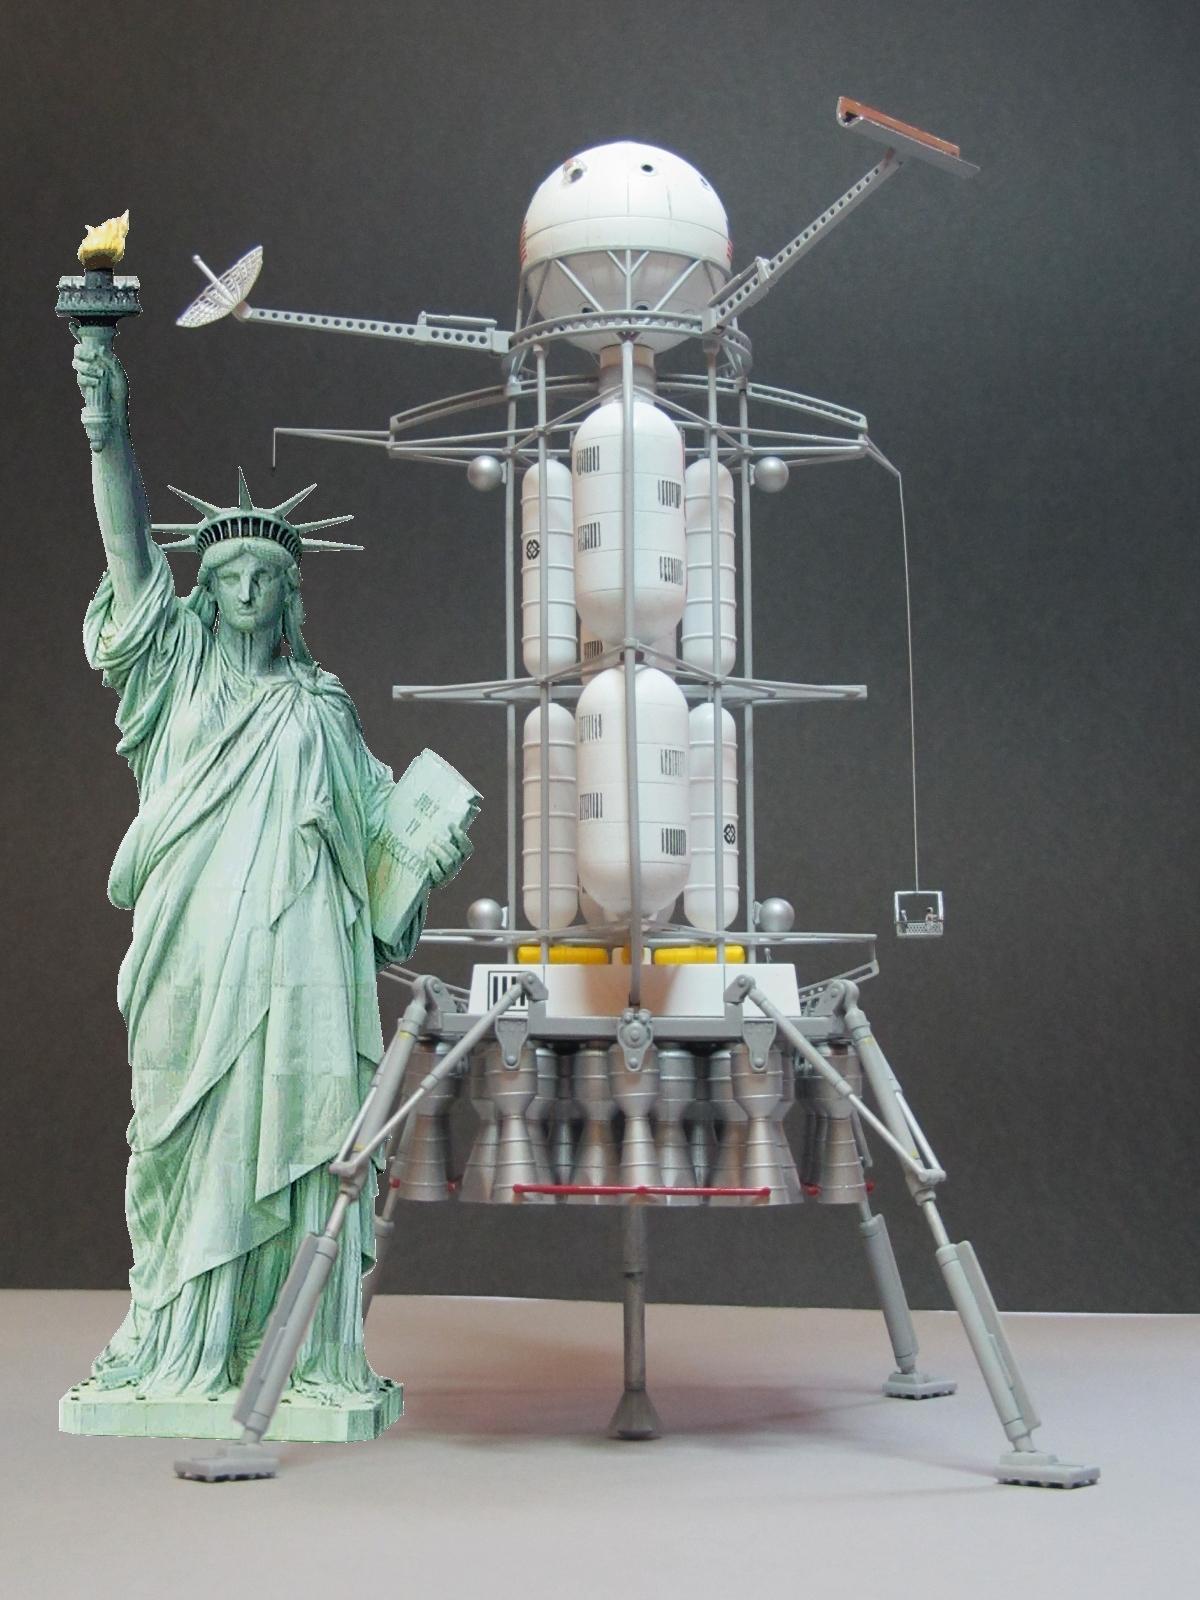 Click image for larger version.  Name:liberty lander.jpg Views:22 Size:1.04 MB ID:24561